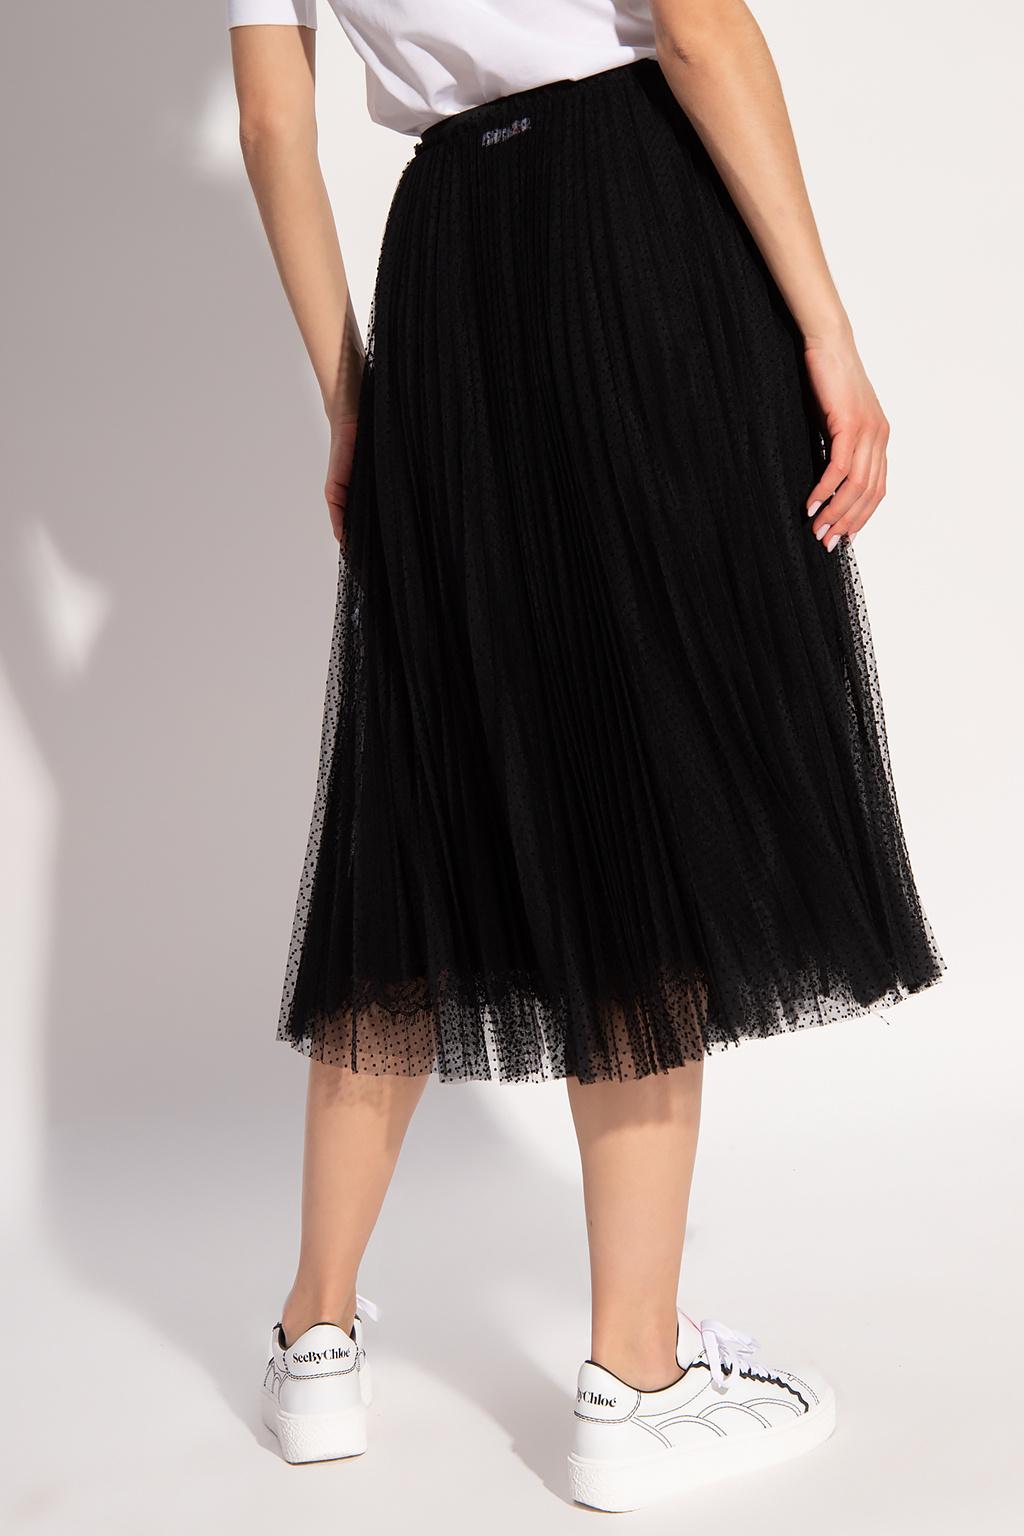 Red Valentino Tulle skirt